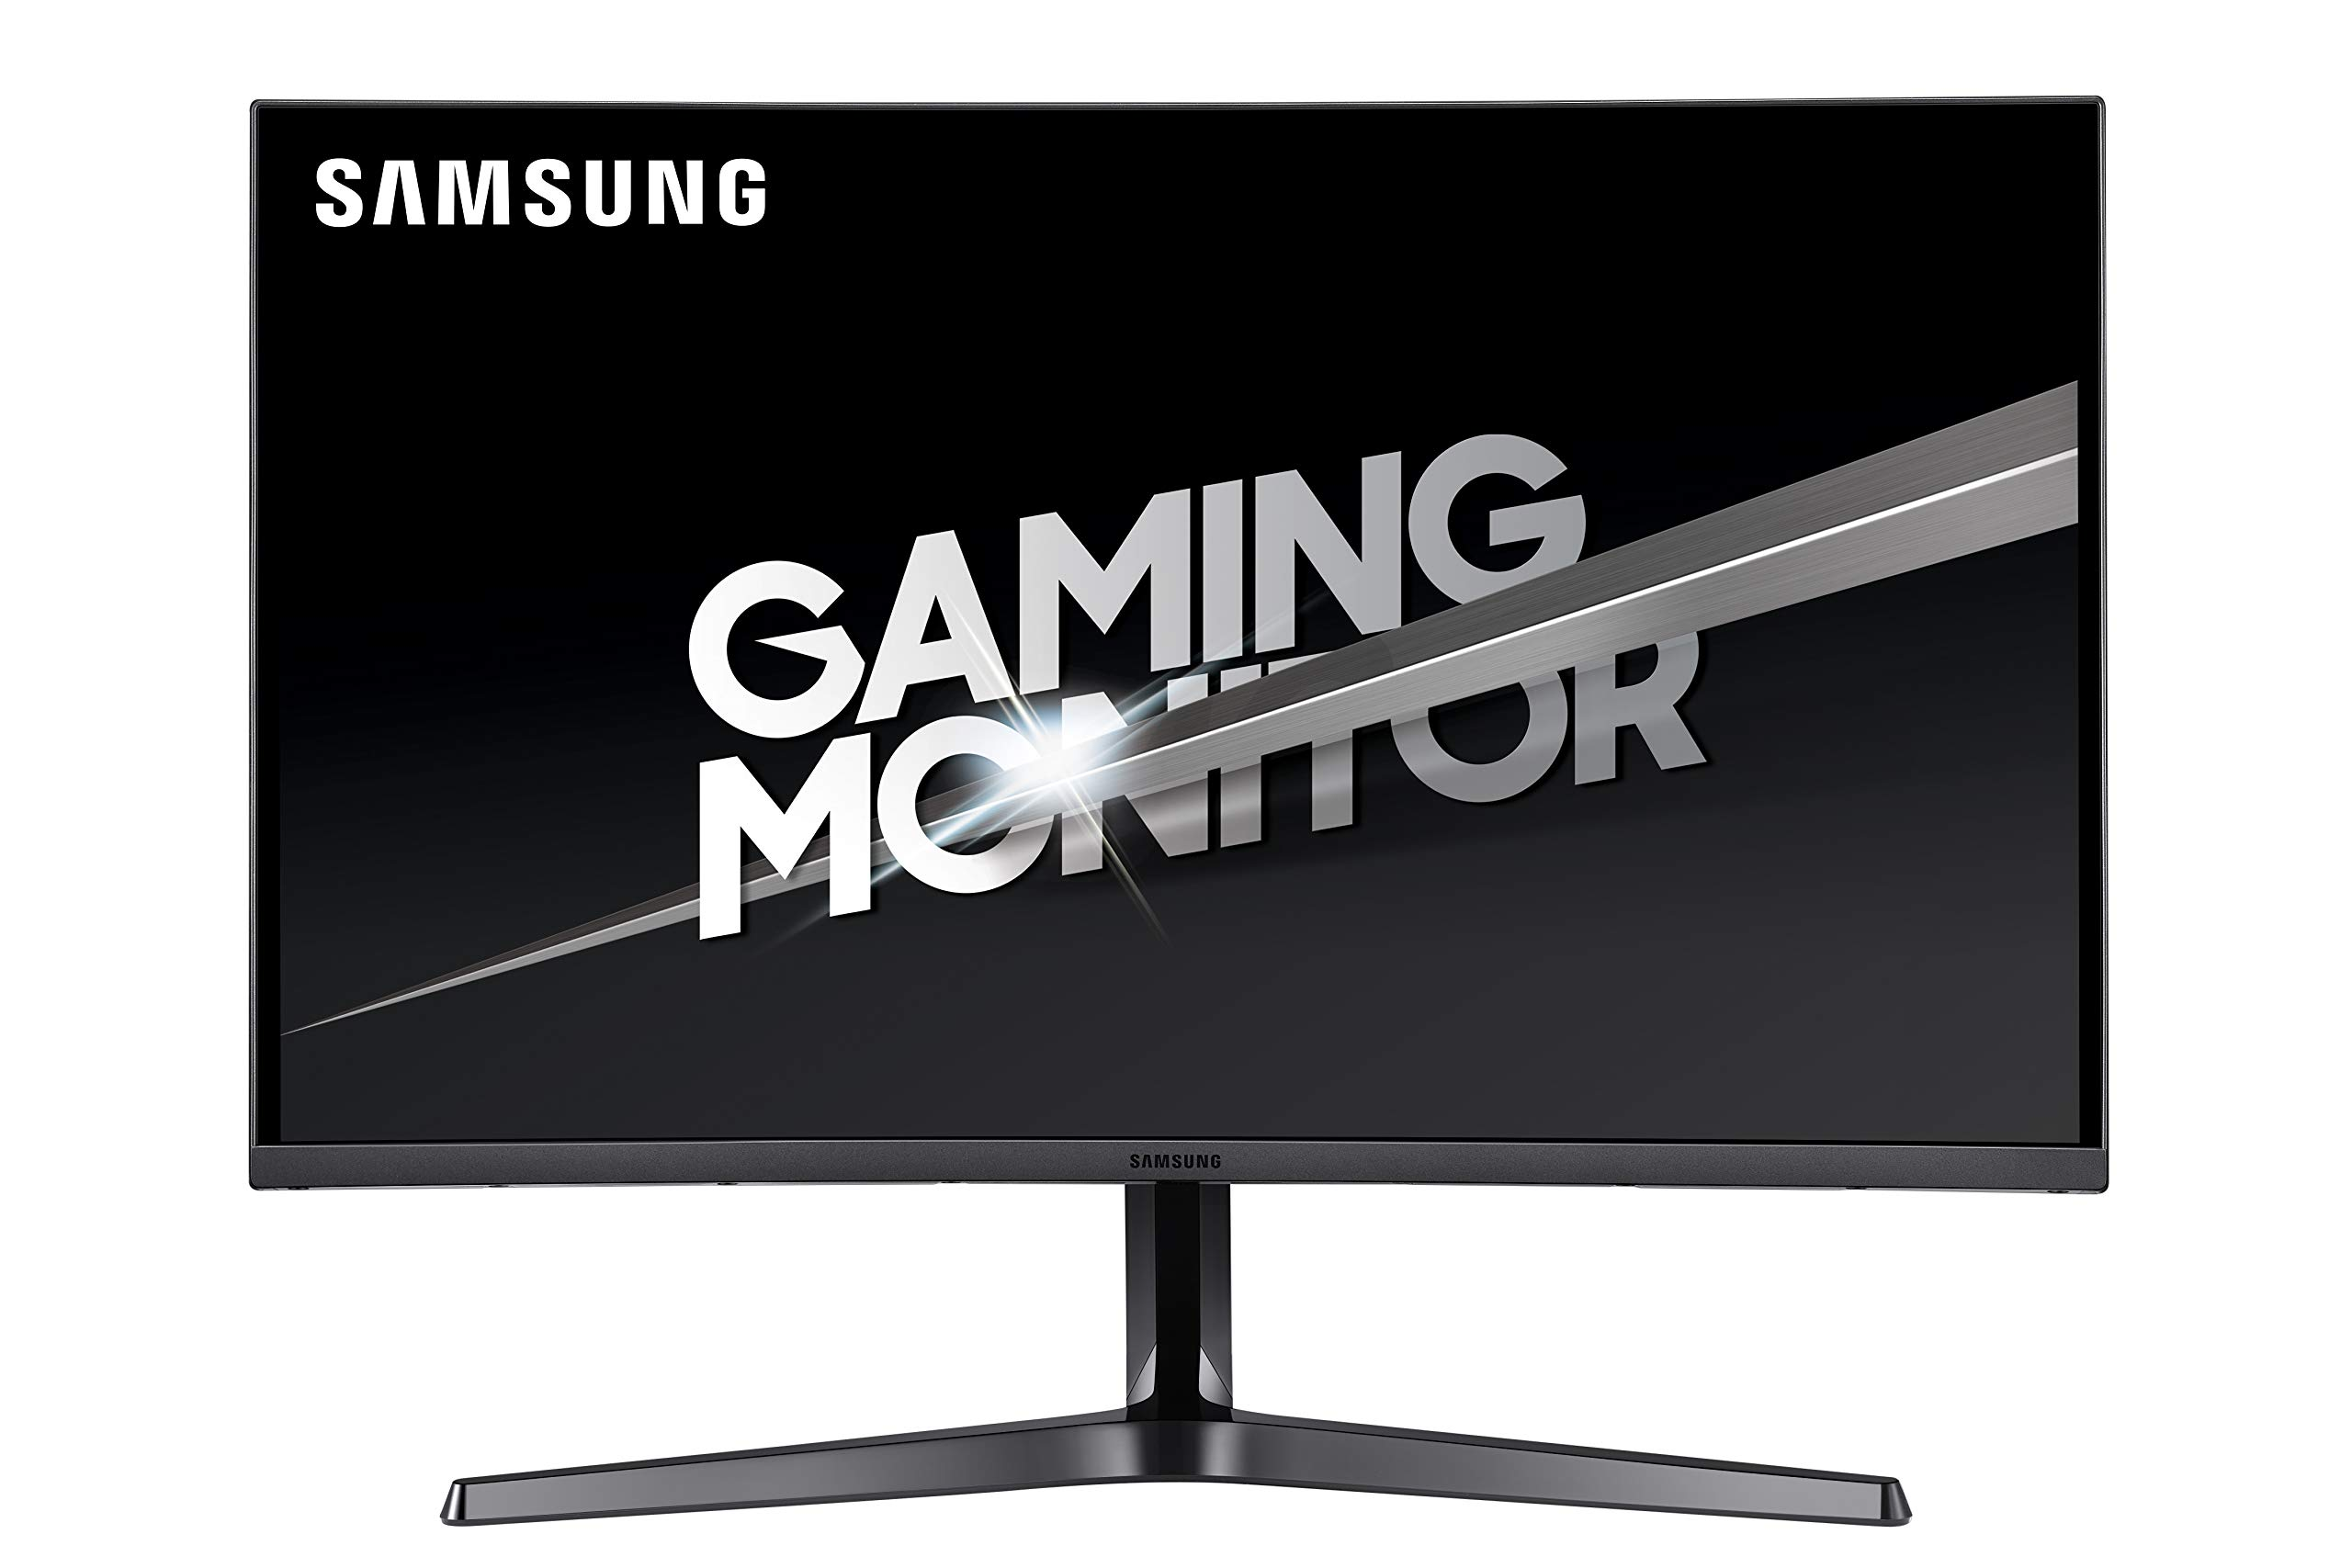 795d5576f36f ... HD Curved Screen LED Monitor Glossy White LC32F397FWNXZ. $268.95.  Samsung CJG5 Series 32-Inch WQHD Curved Gaming Monitor (LC32JG50QQNZA),  Dark Grey